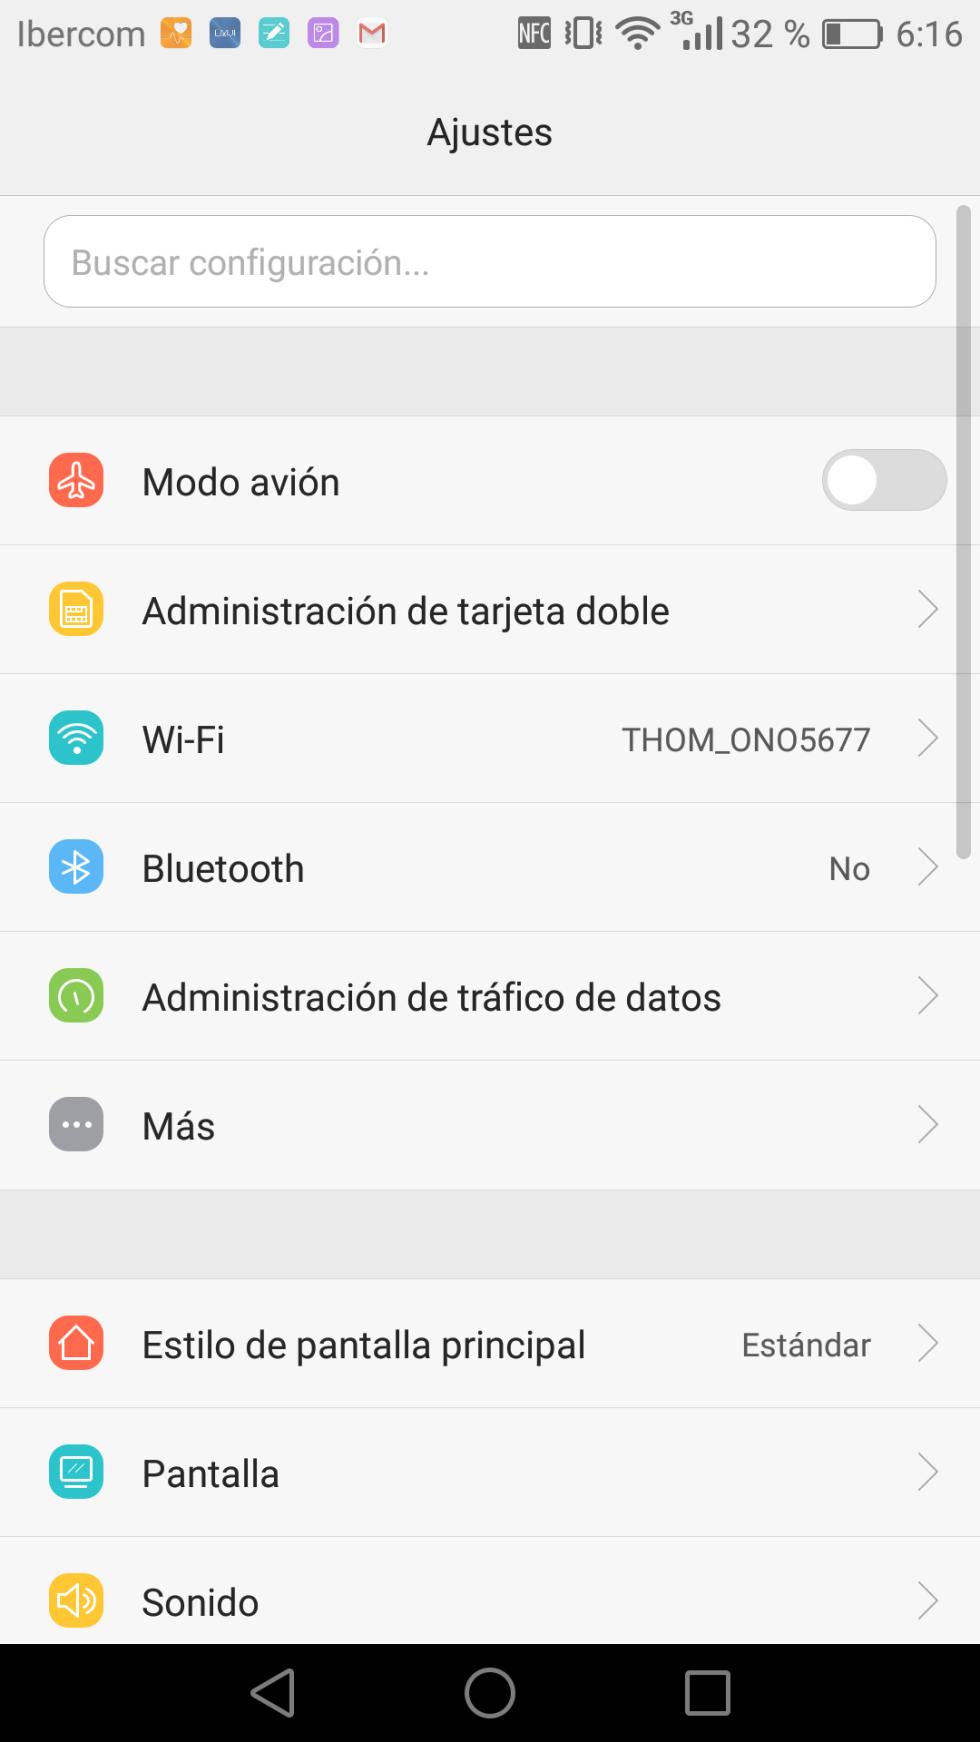 Interfaz del Huawei Mate 8